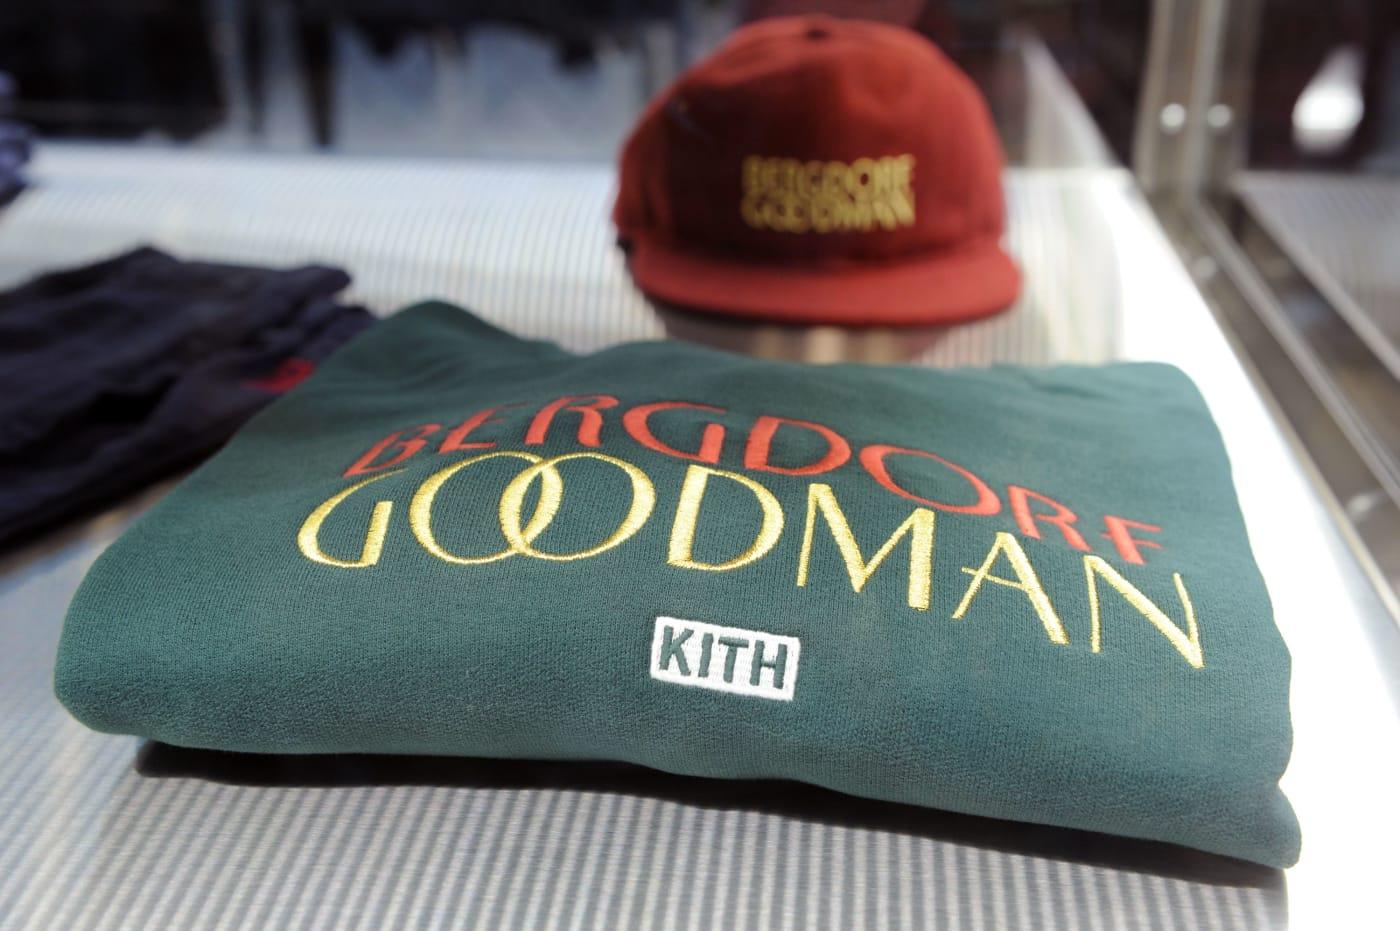 Kith x Bergdorf Goodman Collaboration